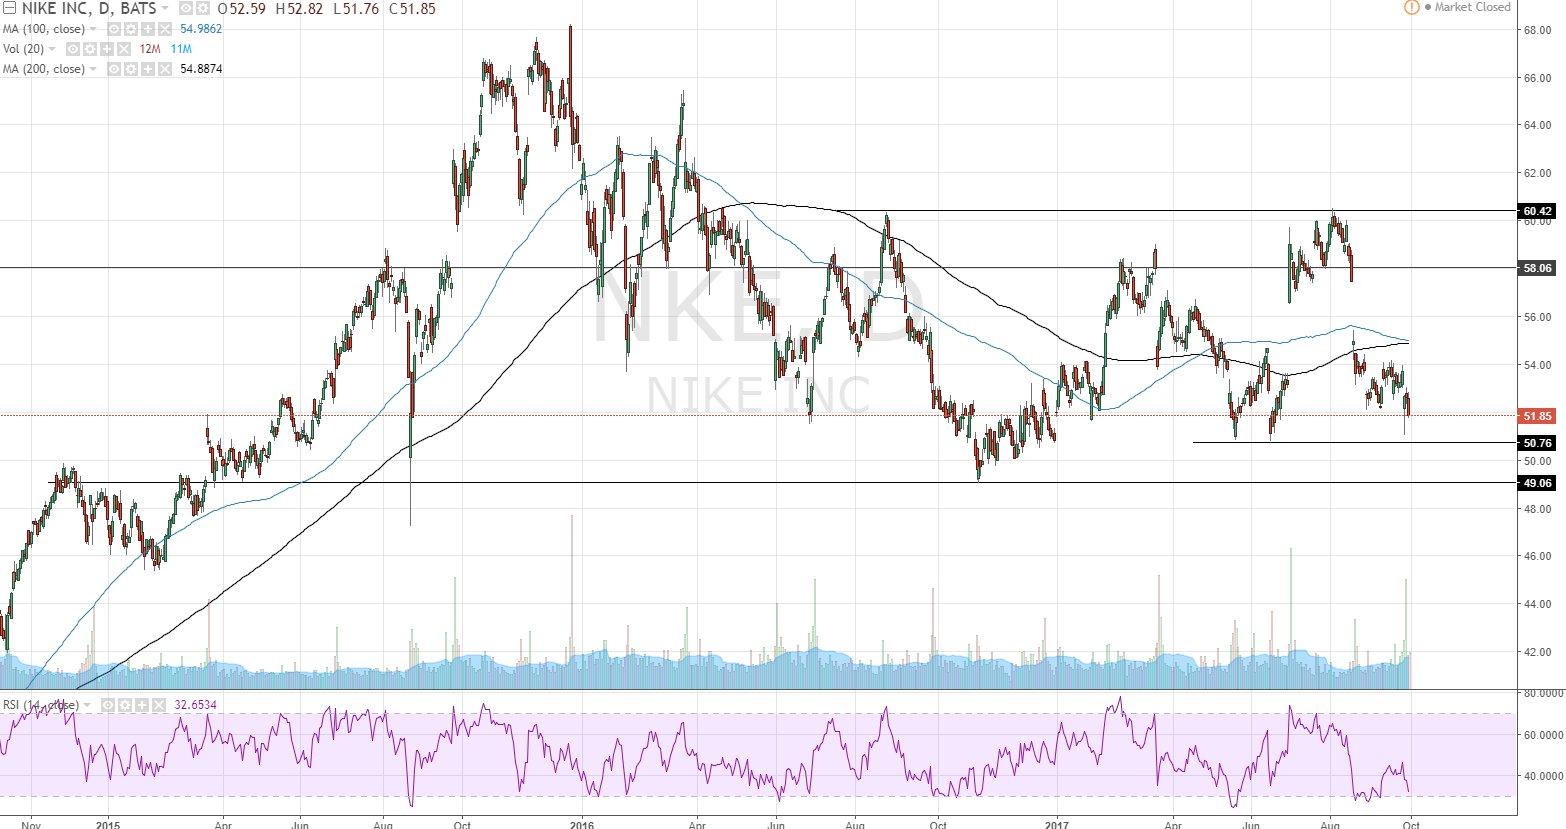 Nike (NKE) Falling Towards Key Range Support